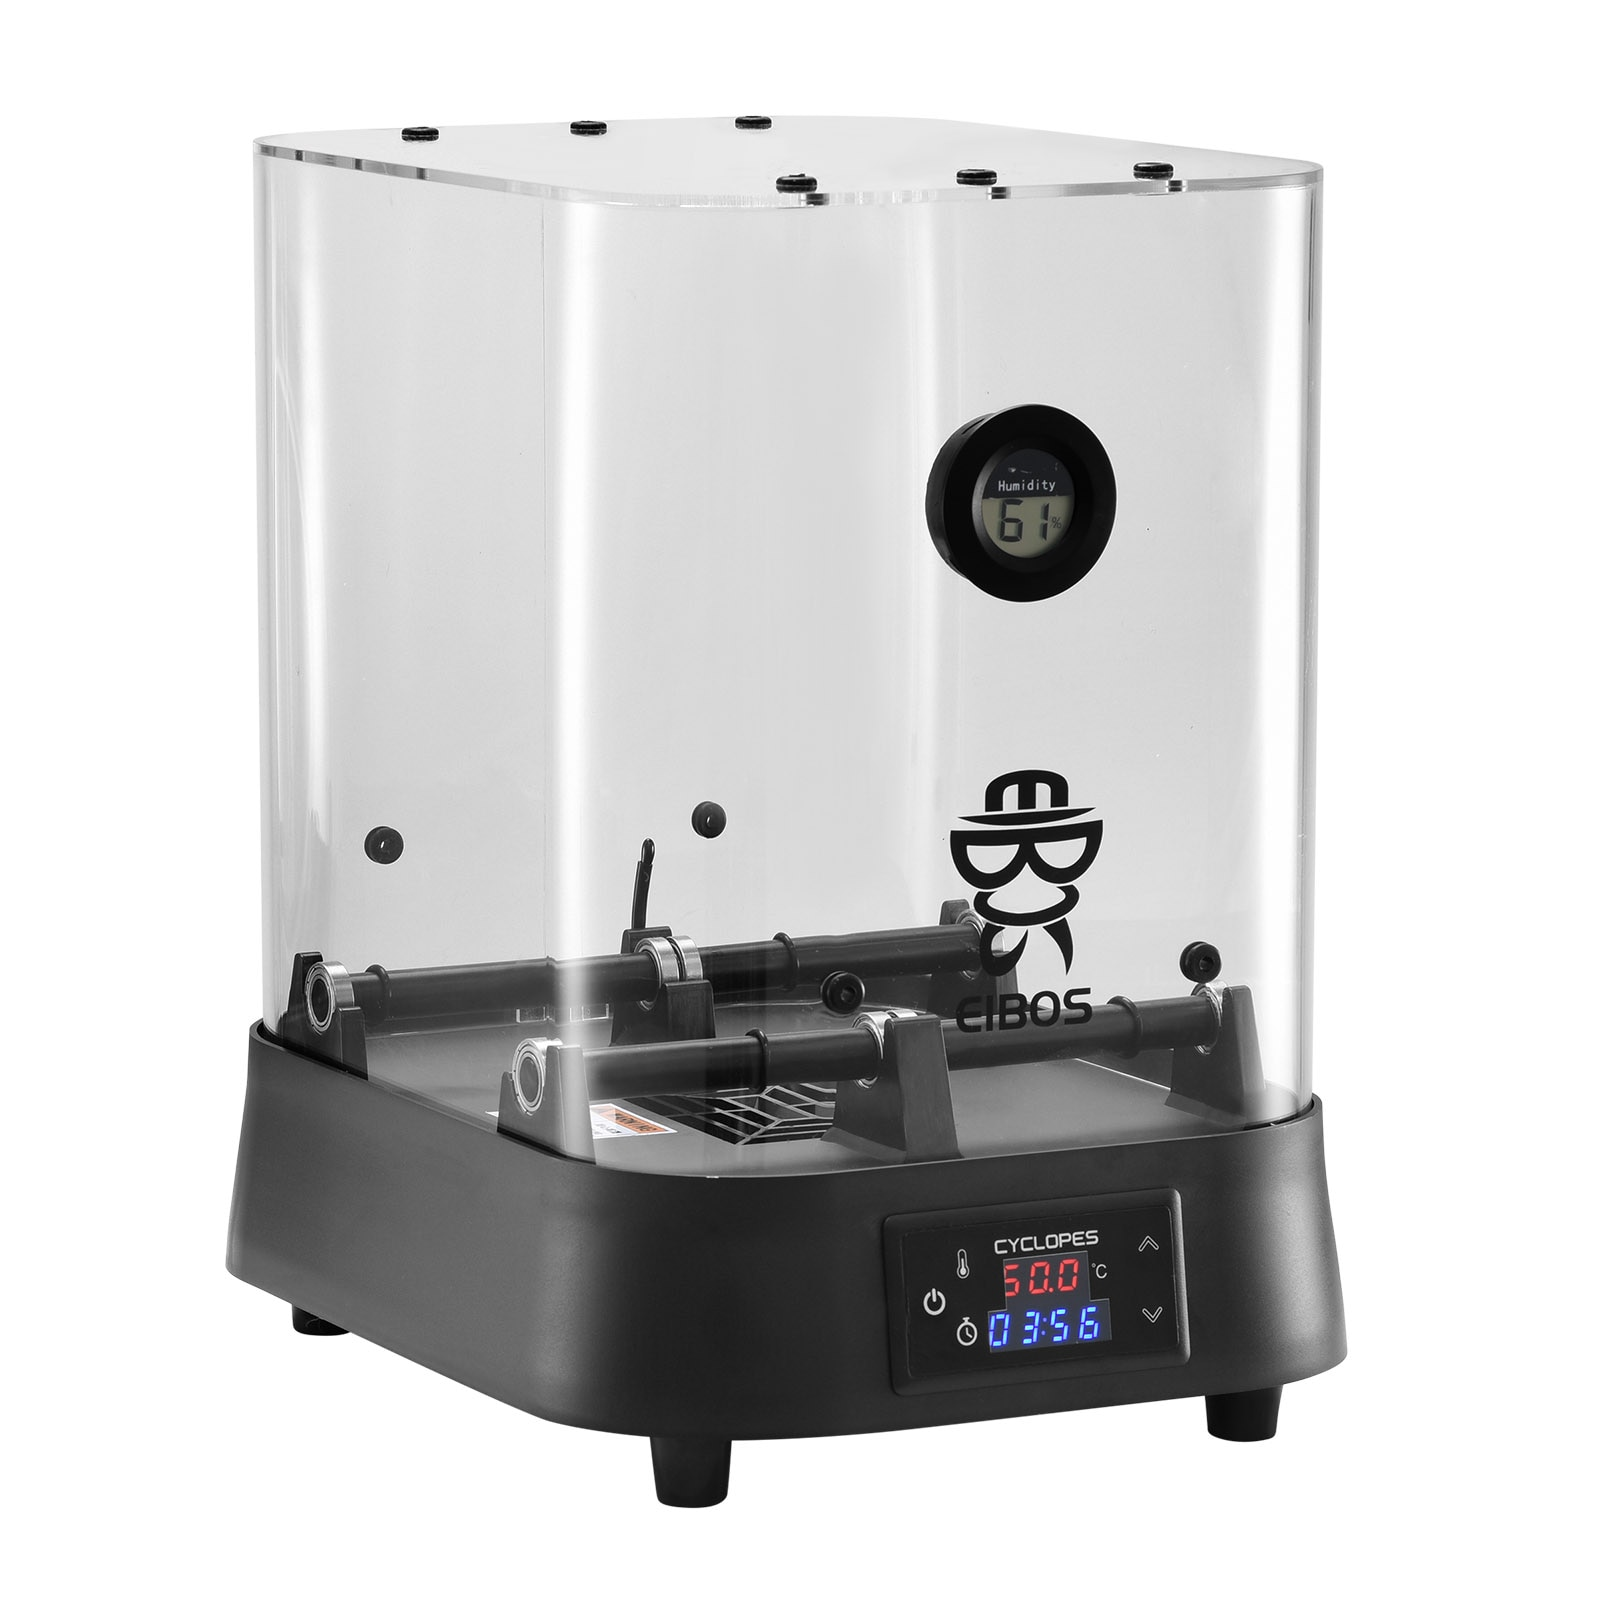 EIBOS 3D Printing Filament Storage Box Filament Storage Holder Keeping Filament Dry Measuring Filament Weight For 3D Printer enlarge